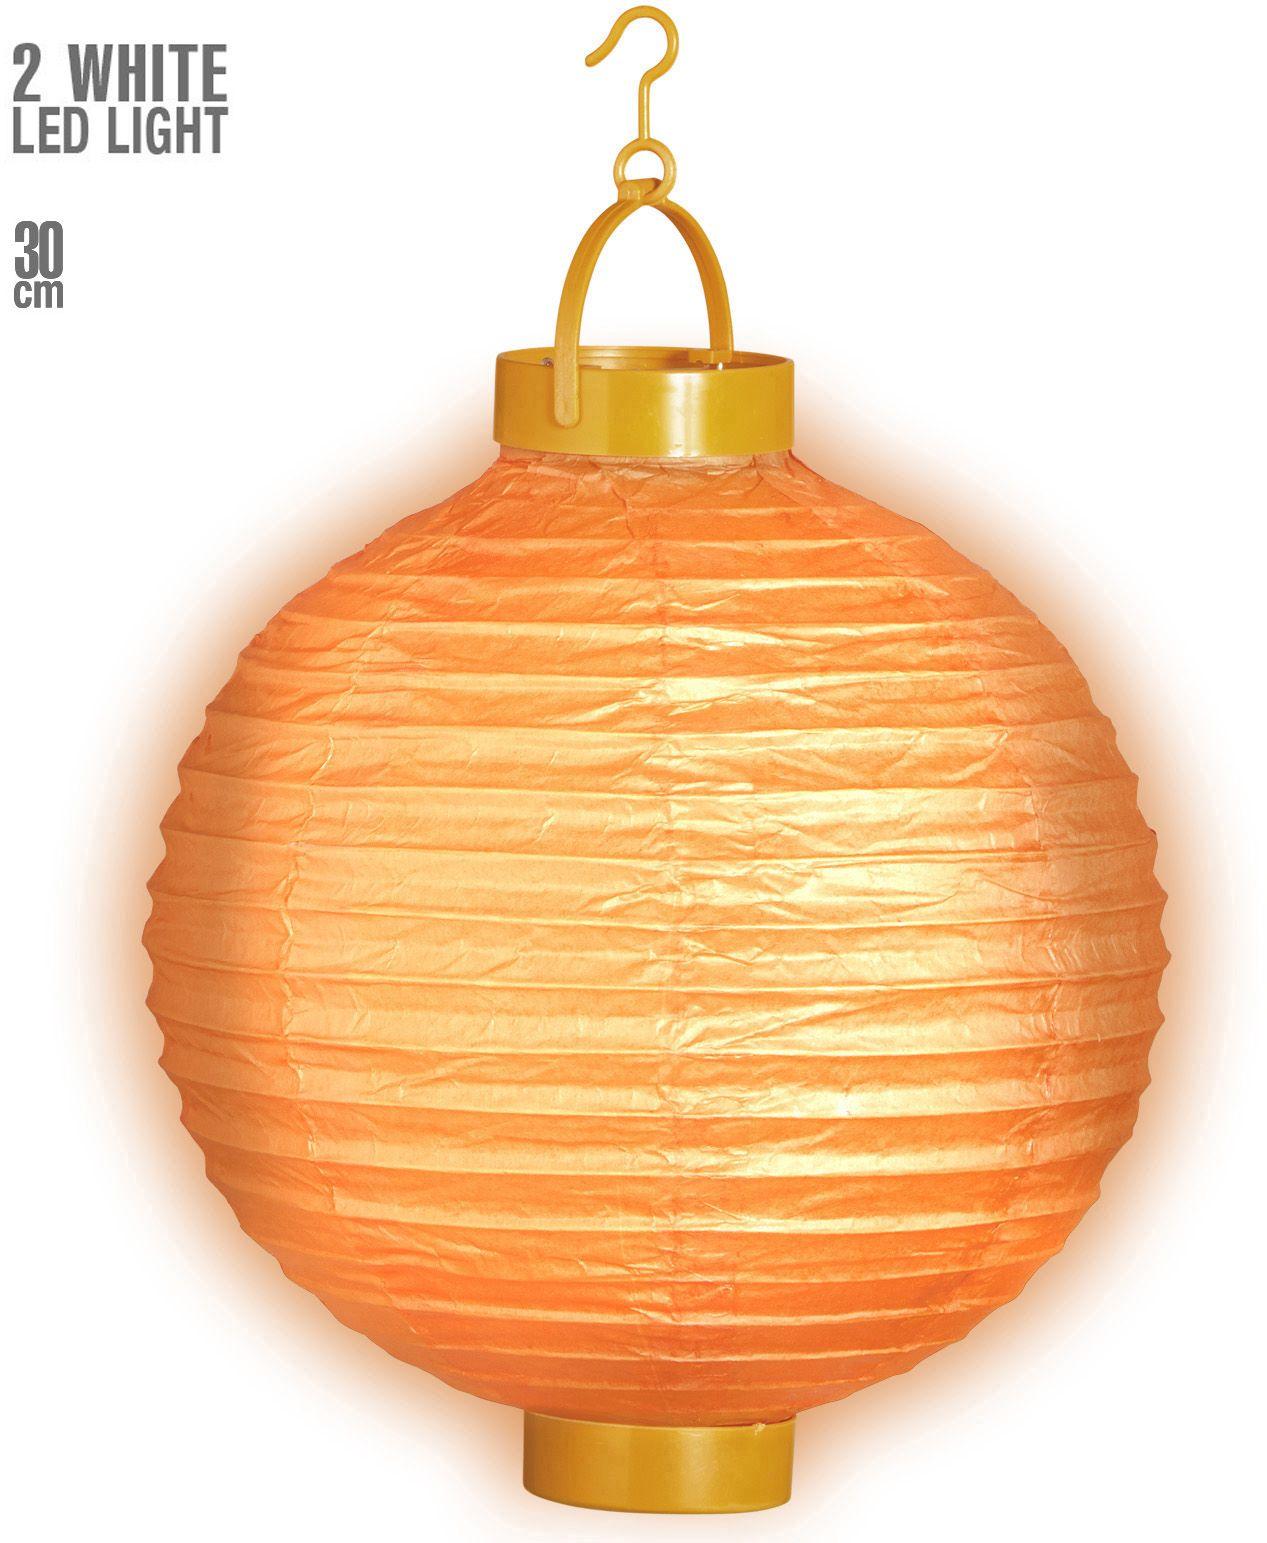 Oranje lampion met 2 witte LED lichten